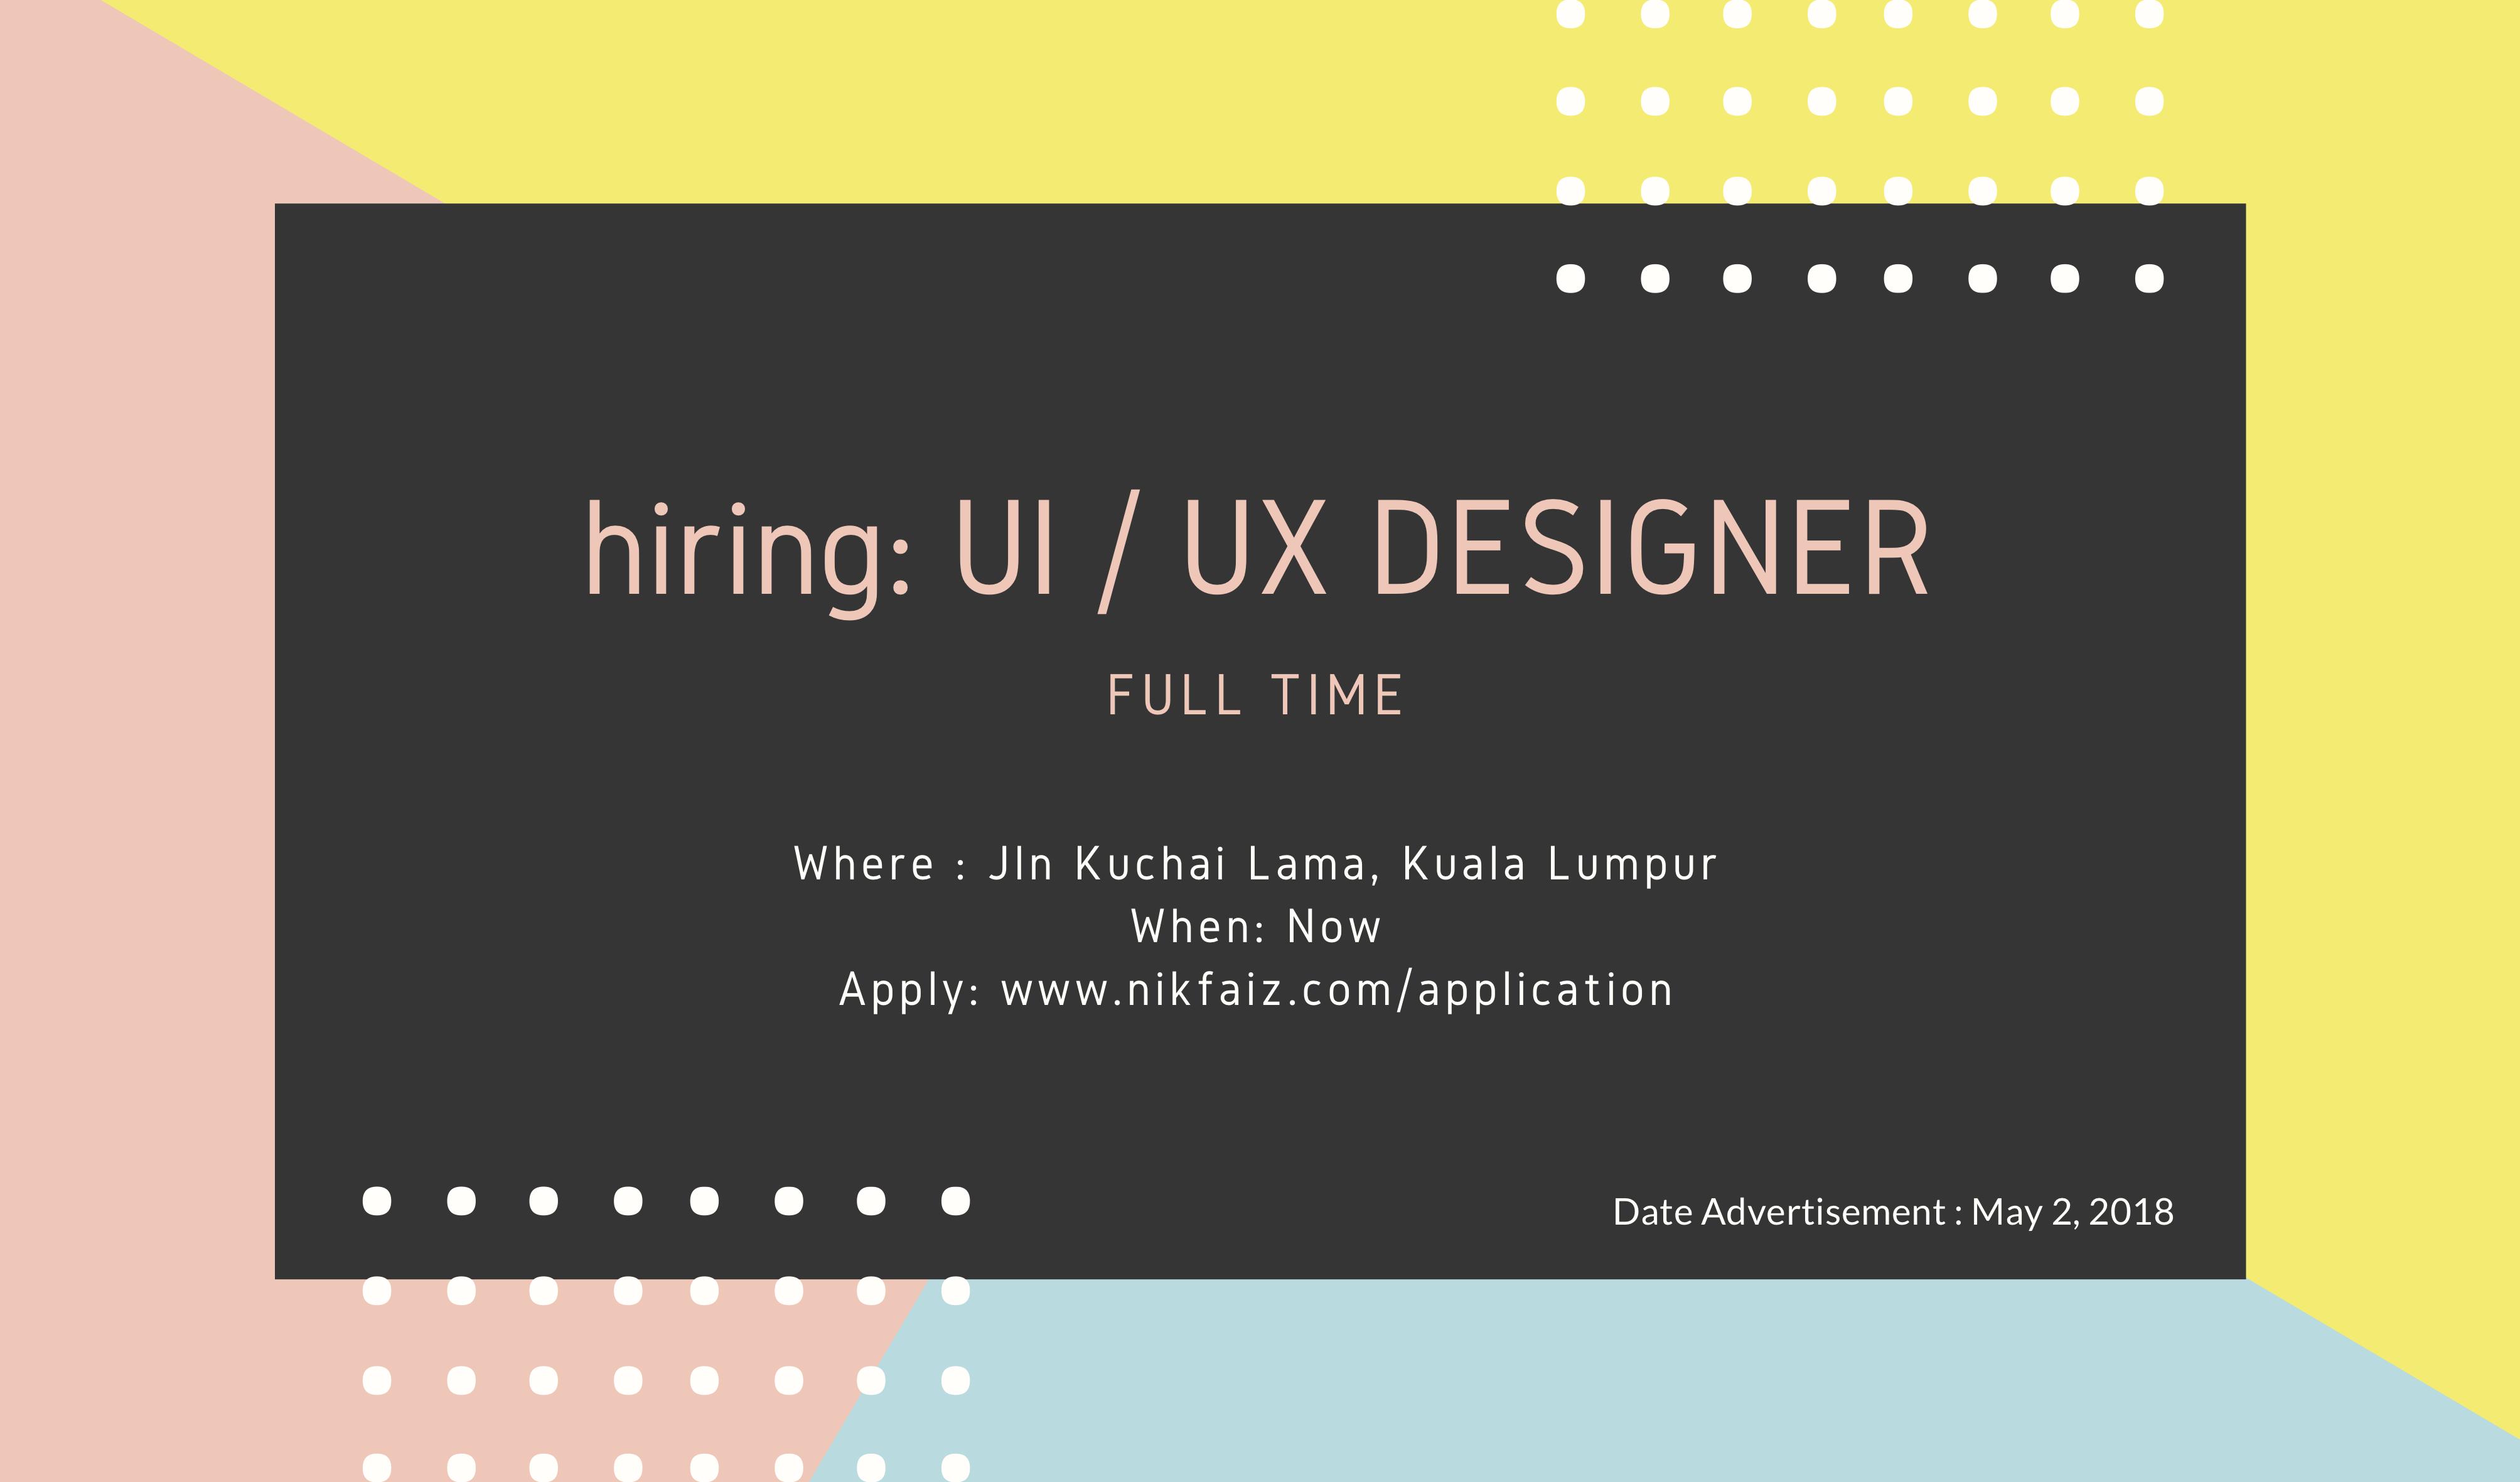 Hiring: UI/UX Developer